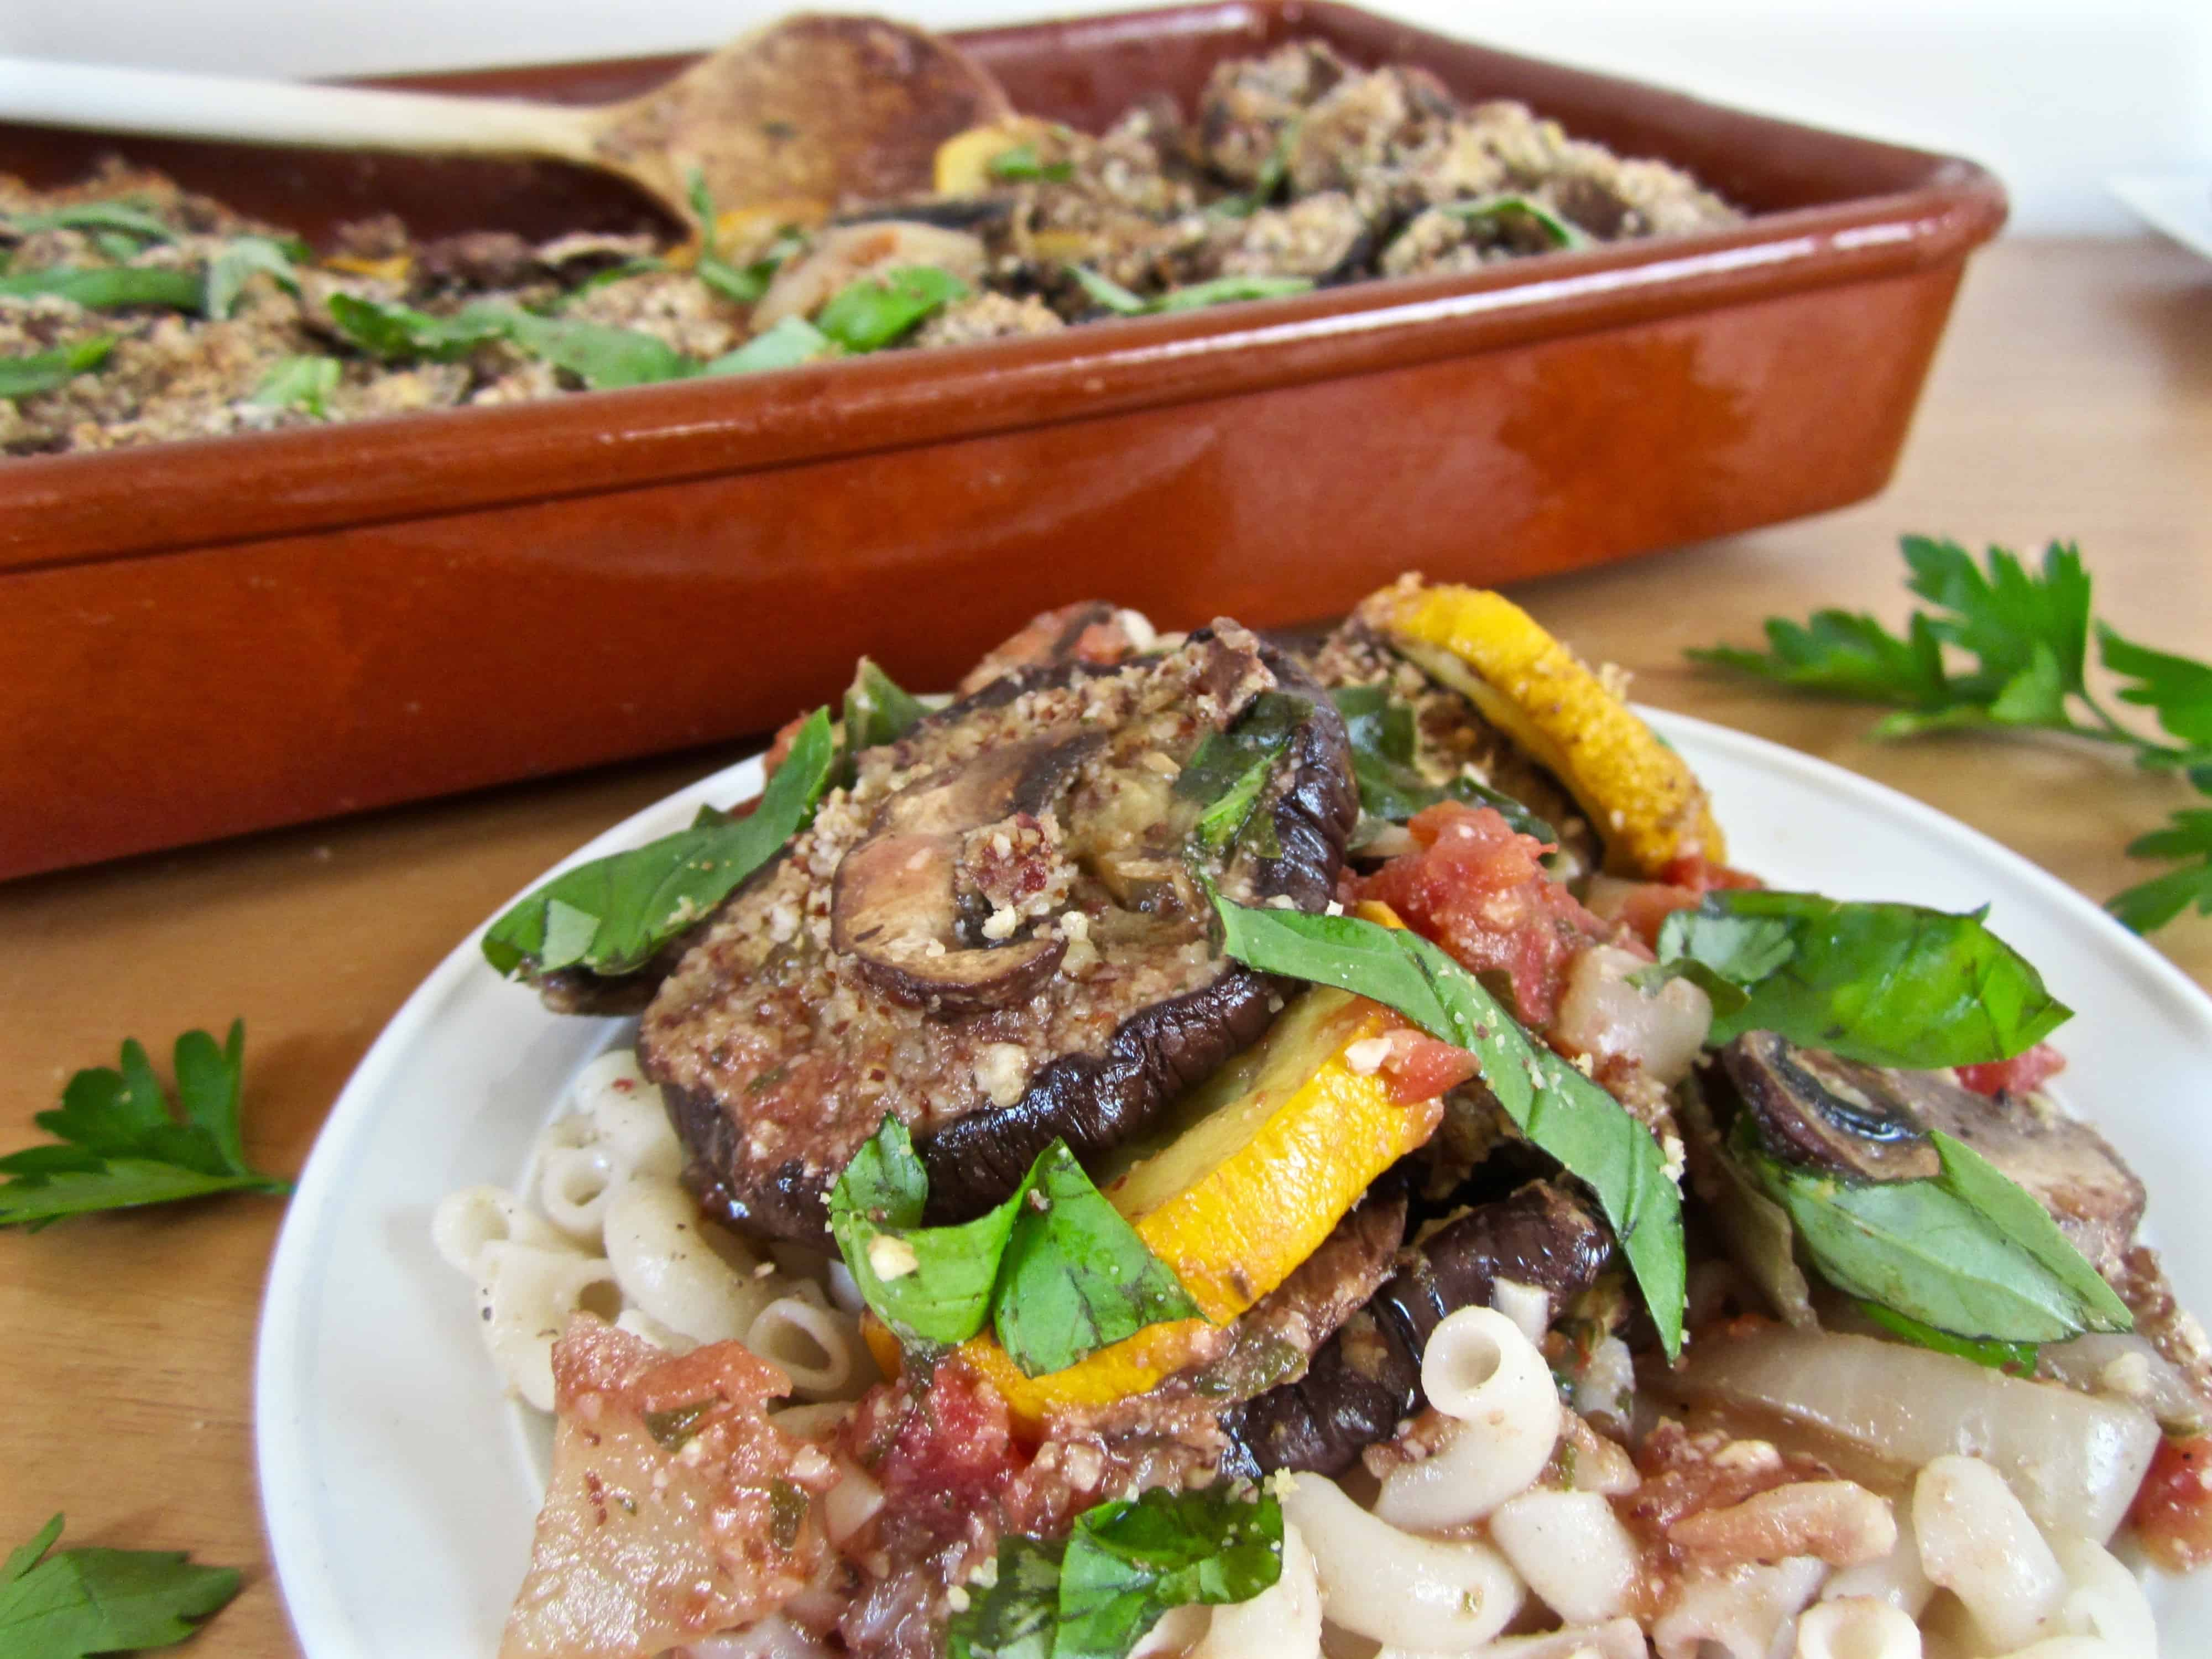 Italian Roasted Veggie Bake with Parmesan & fresh basil, vegan & gluten free! | veganchickpea.com